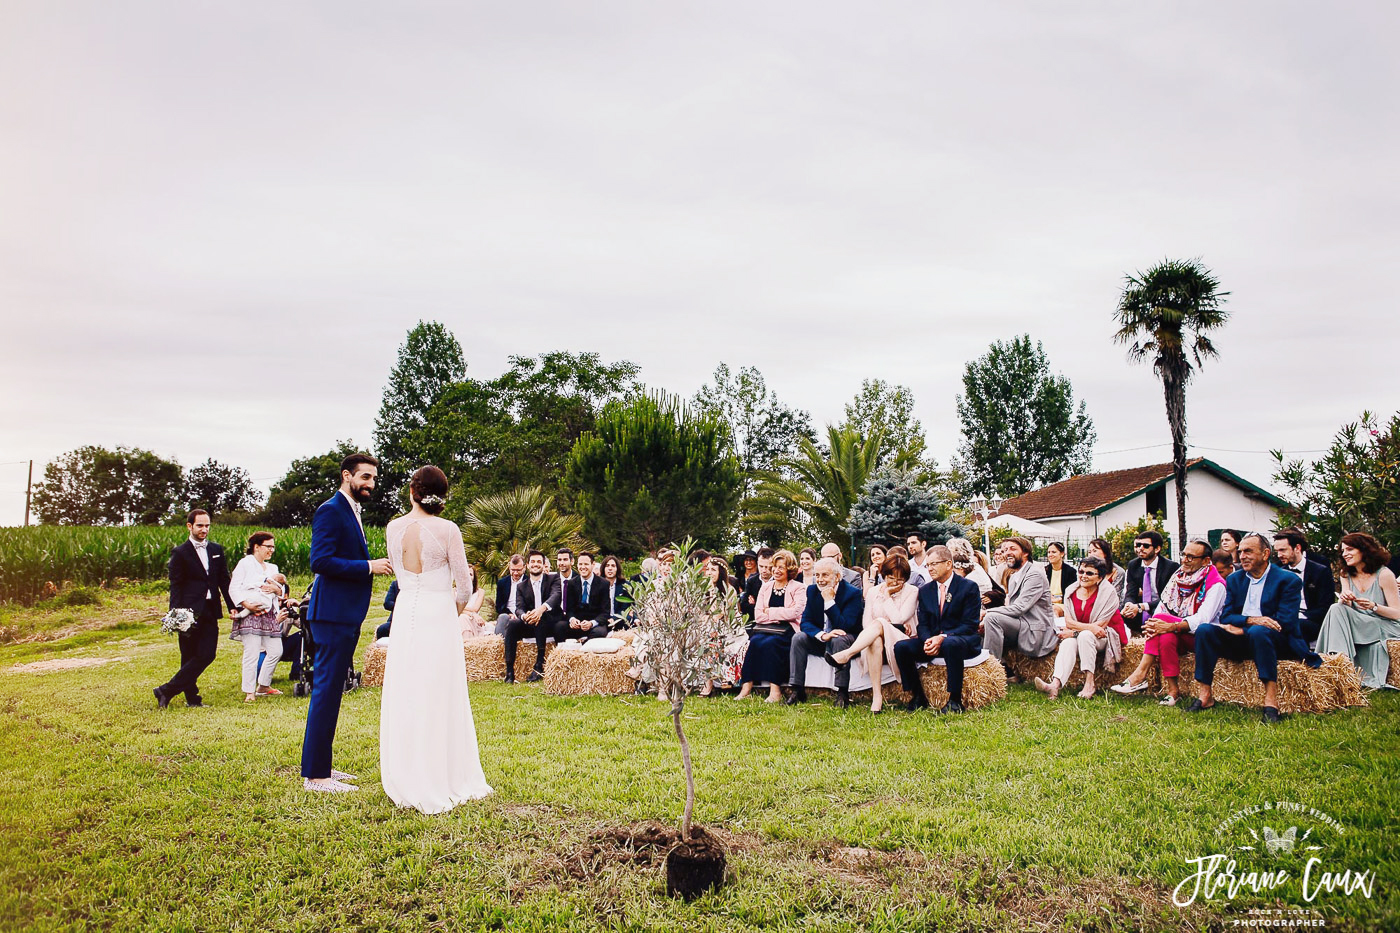 photographe-mariage-pays-basque-Floriane-Caux (35)